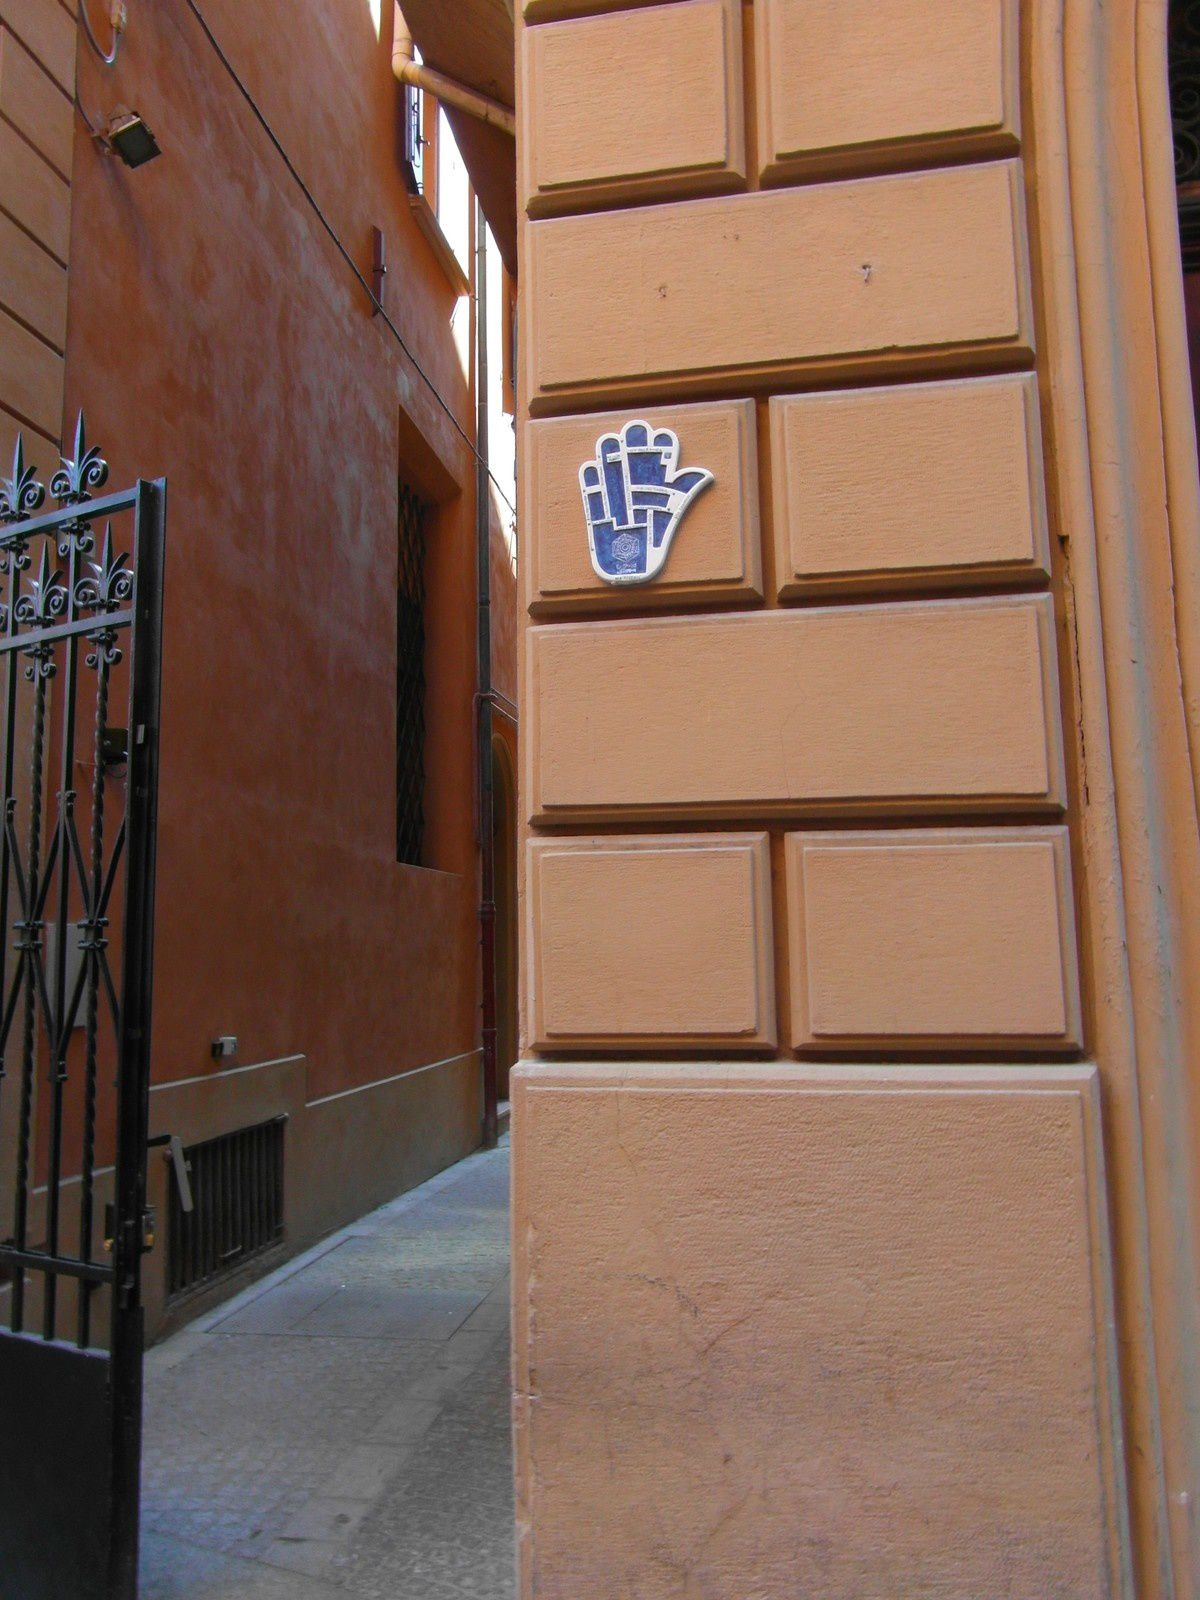 Ruelle du Ghetto Ebraico de Bologne